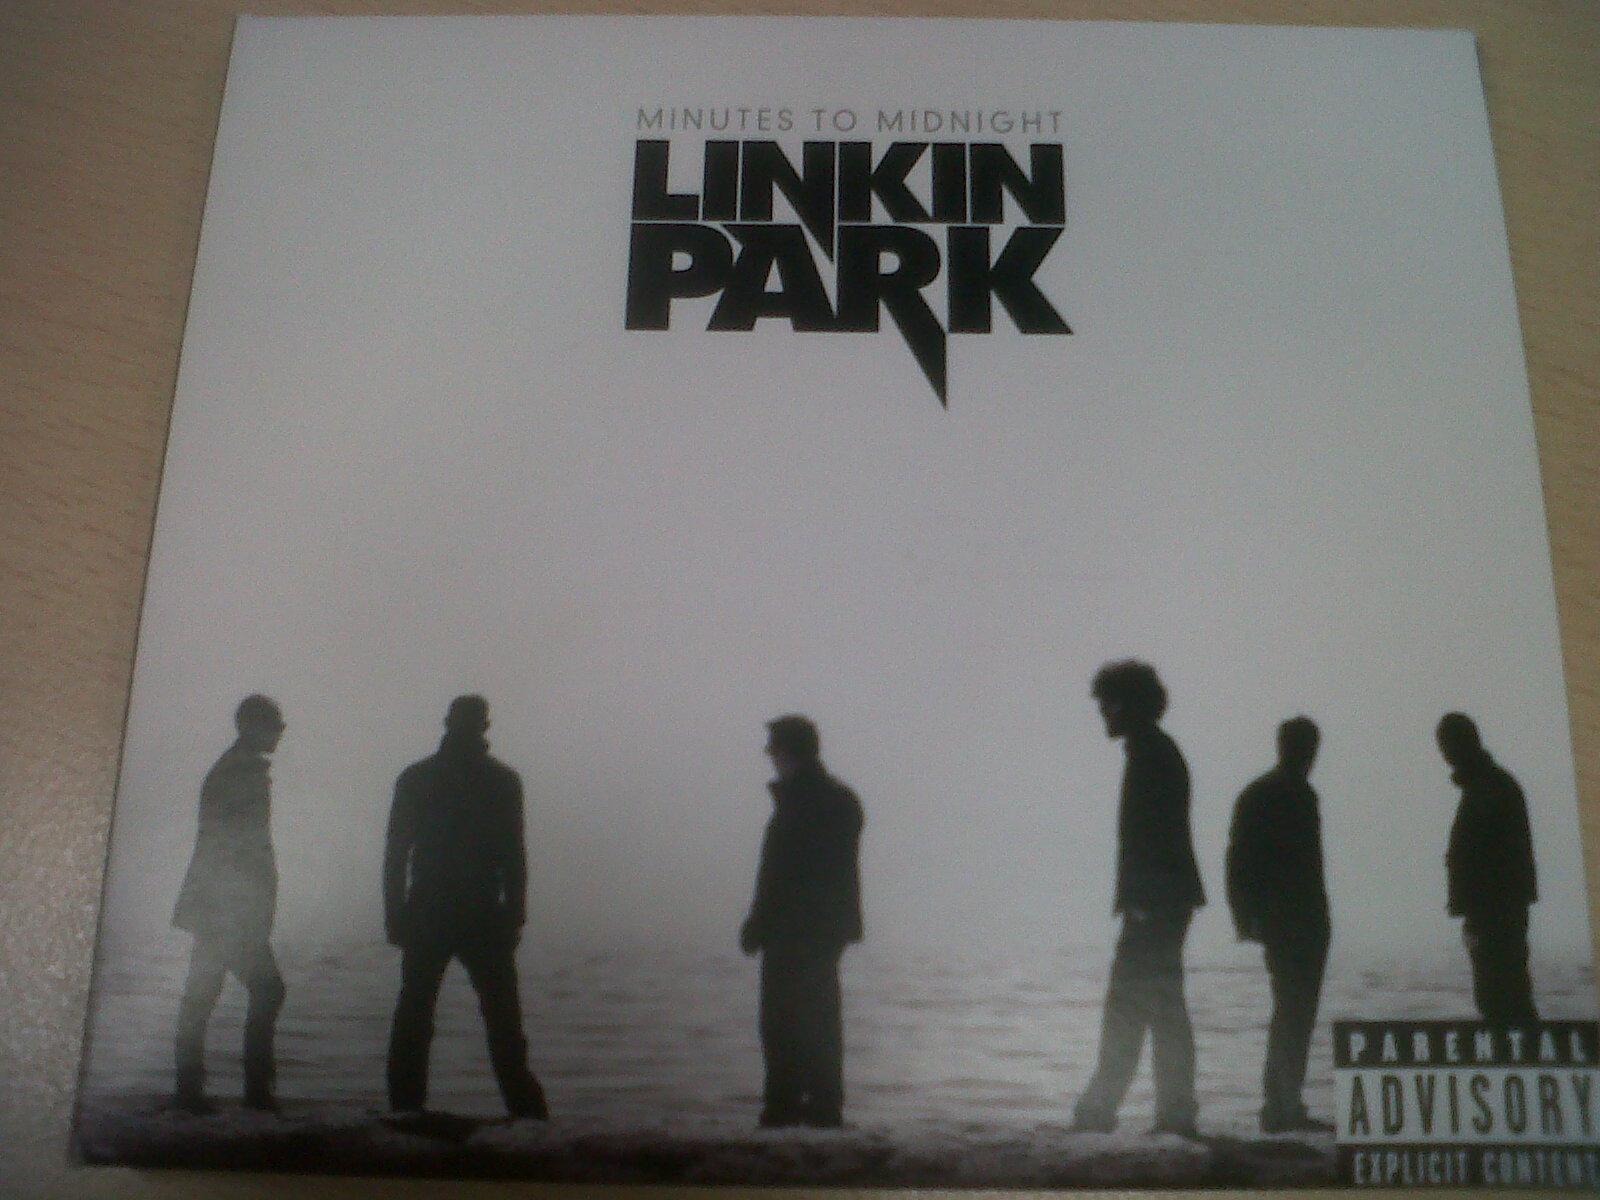 Minutes to midnight linkin park zip download || CRUMPLED